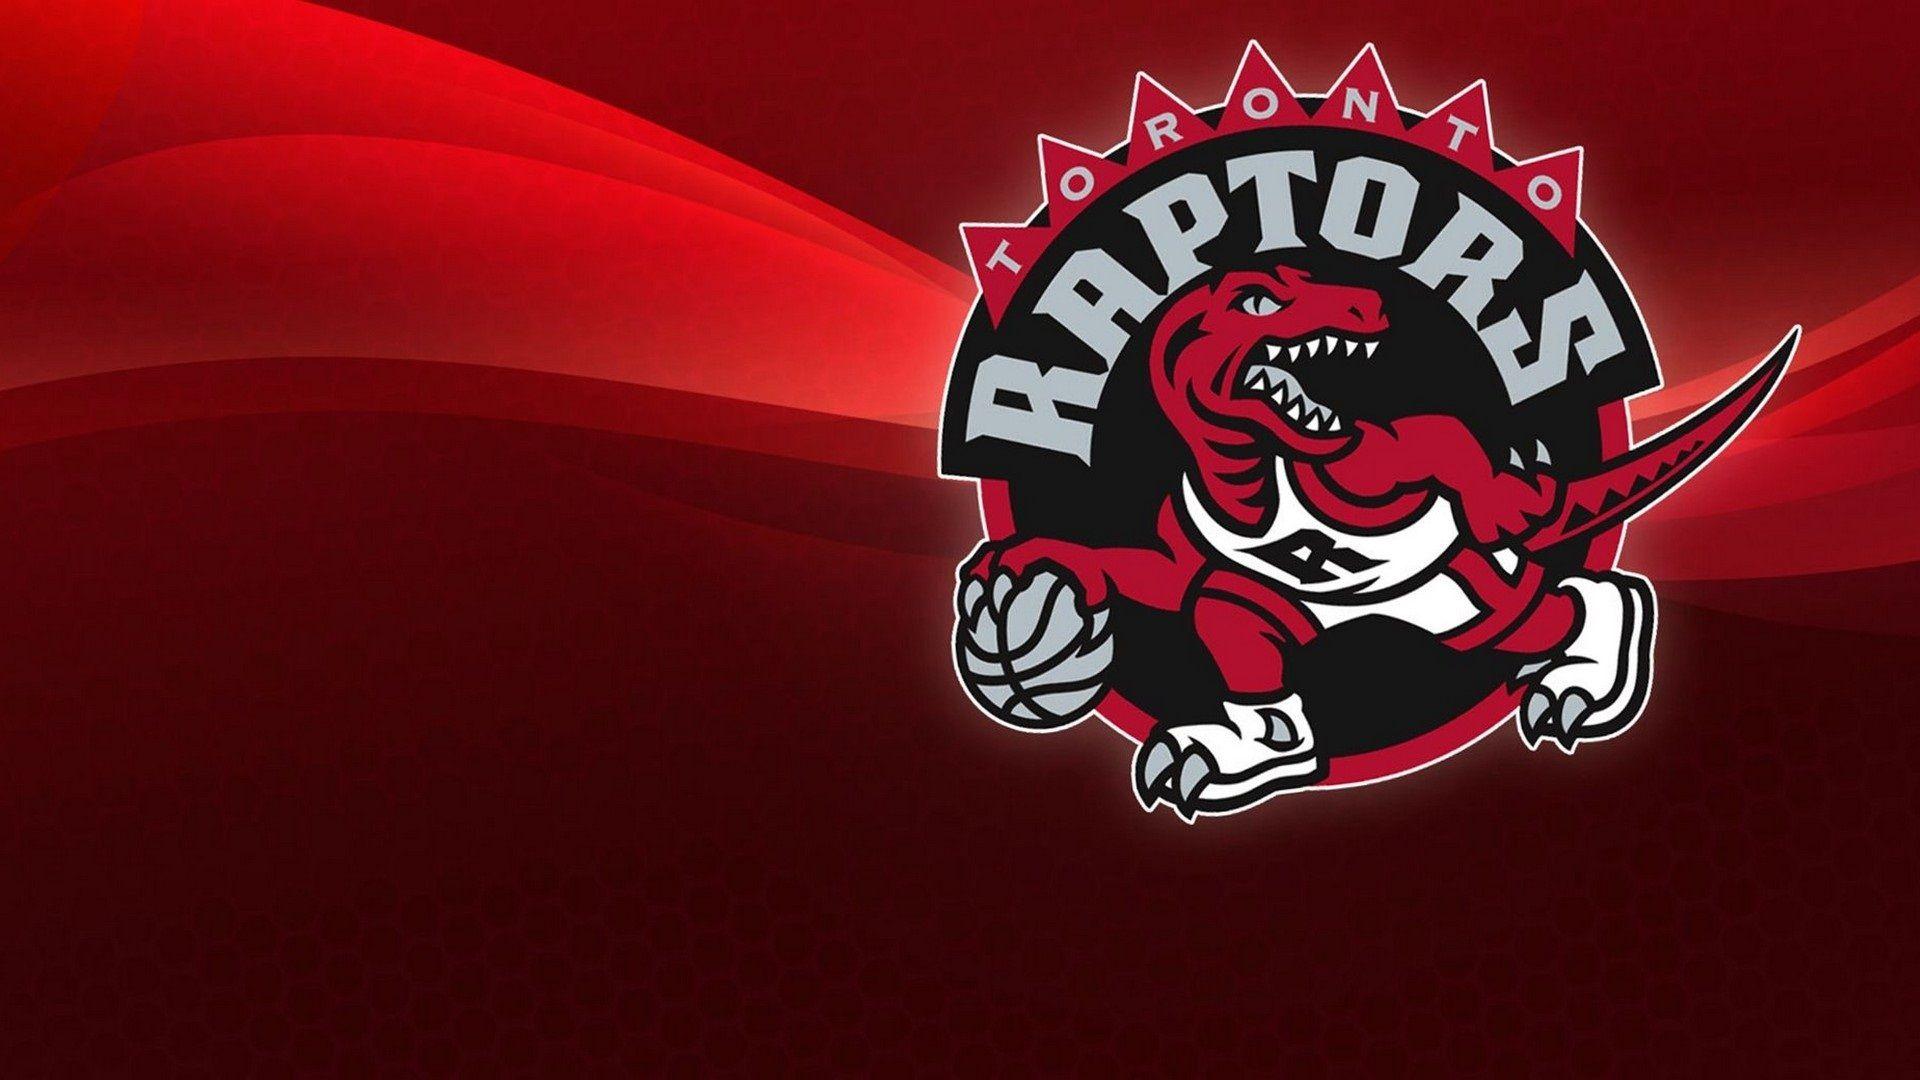 Toronto Raptors Wallpaper Hd Raptors Wallpaper Toronto Raptors Basketball Wallpapers Hd